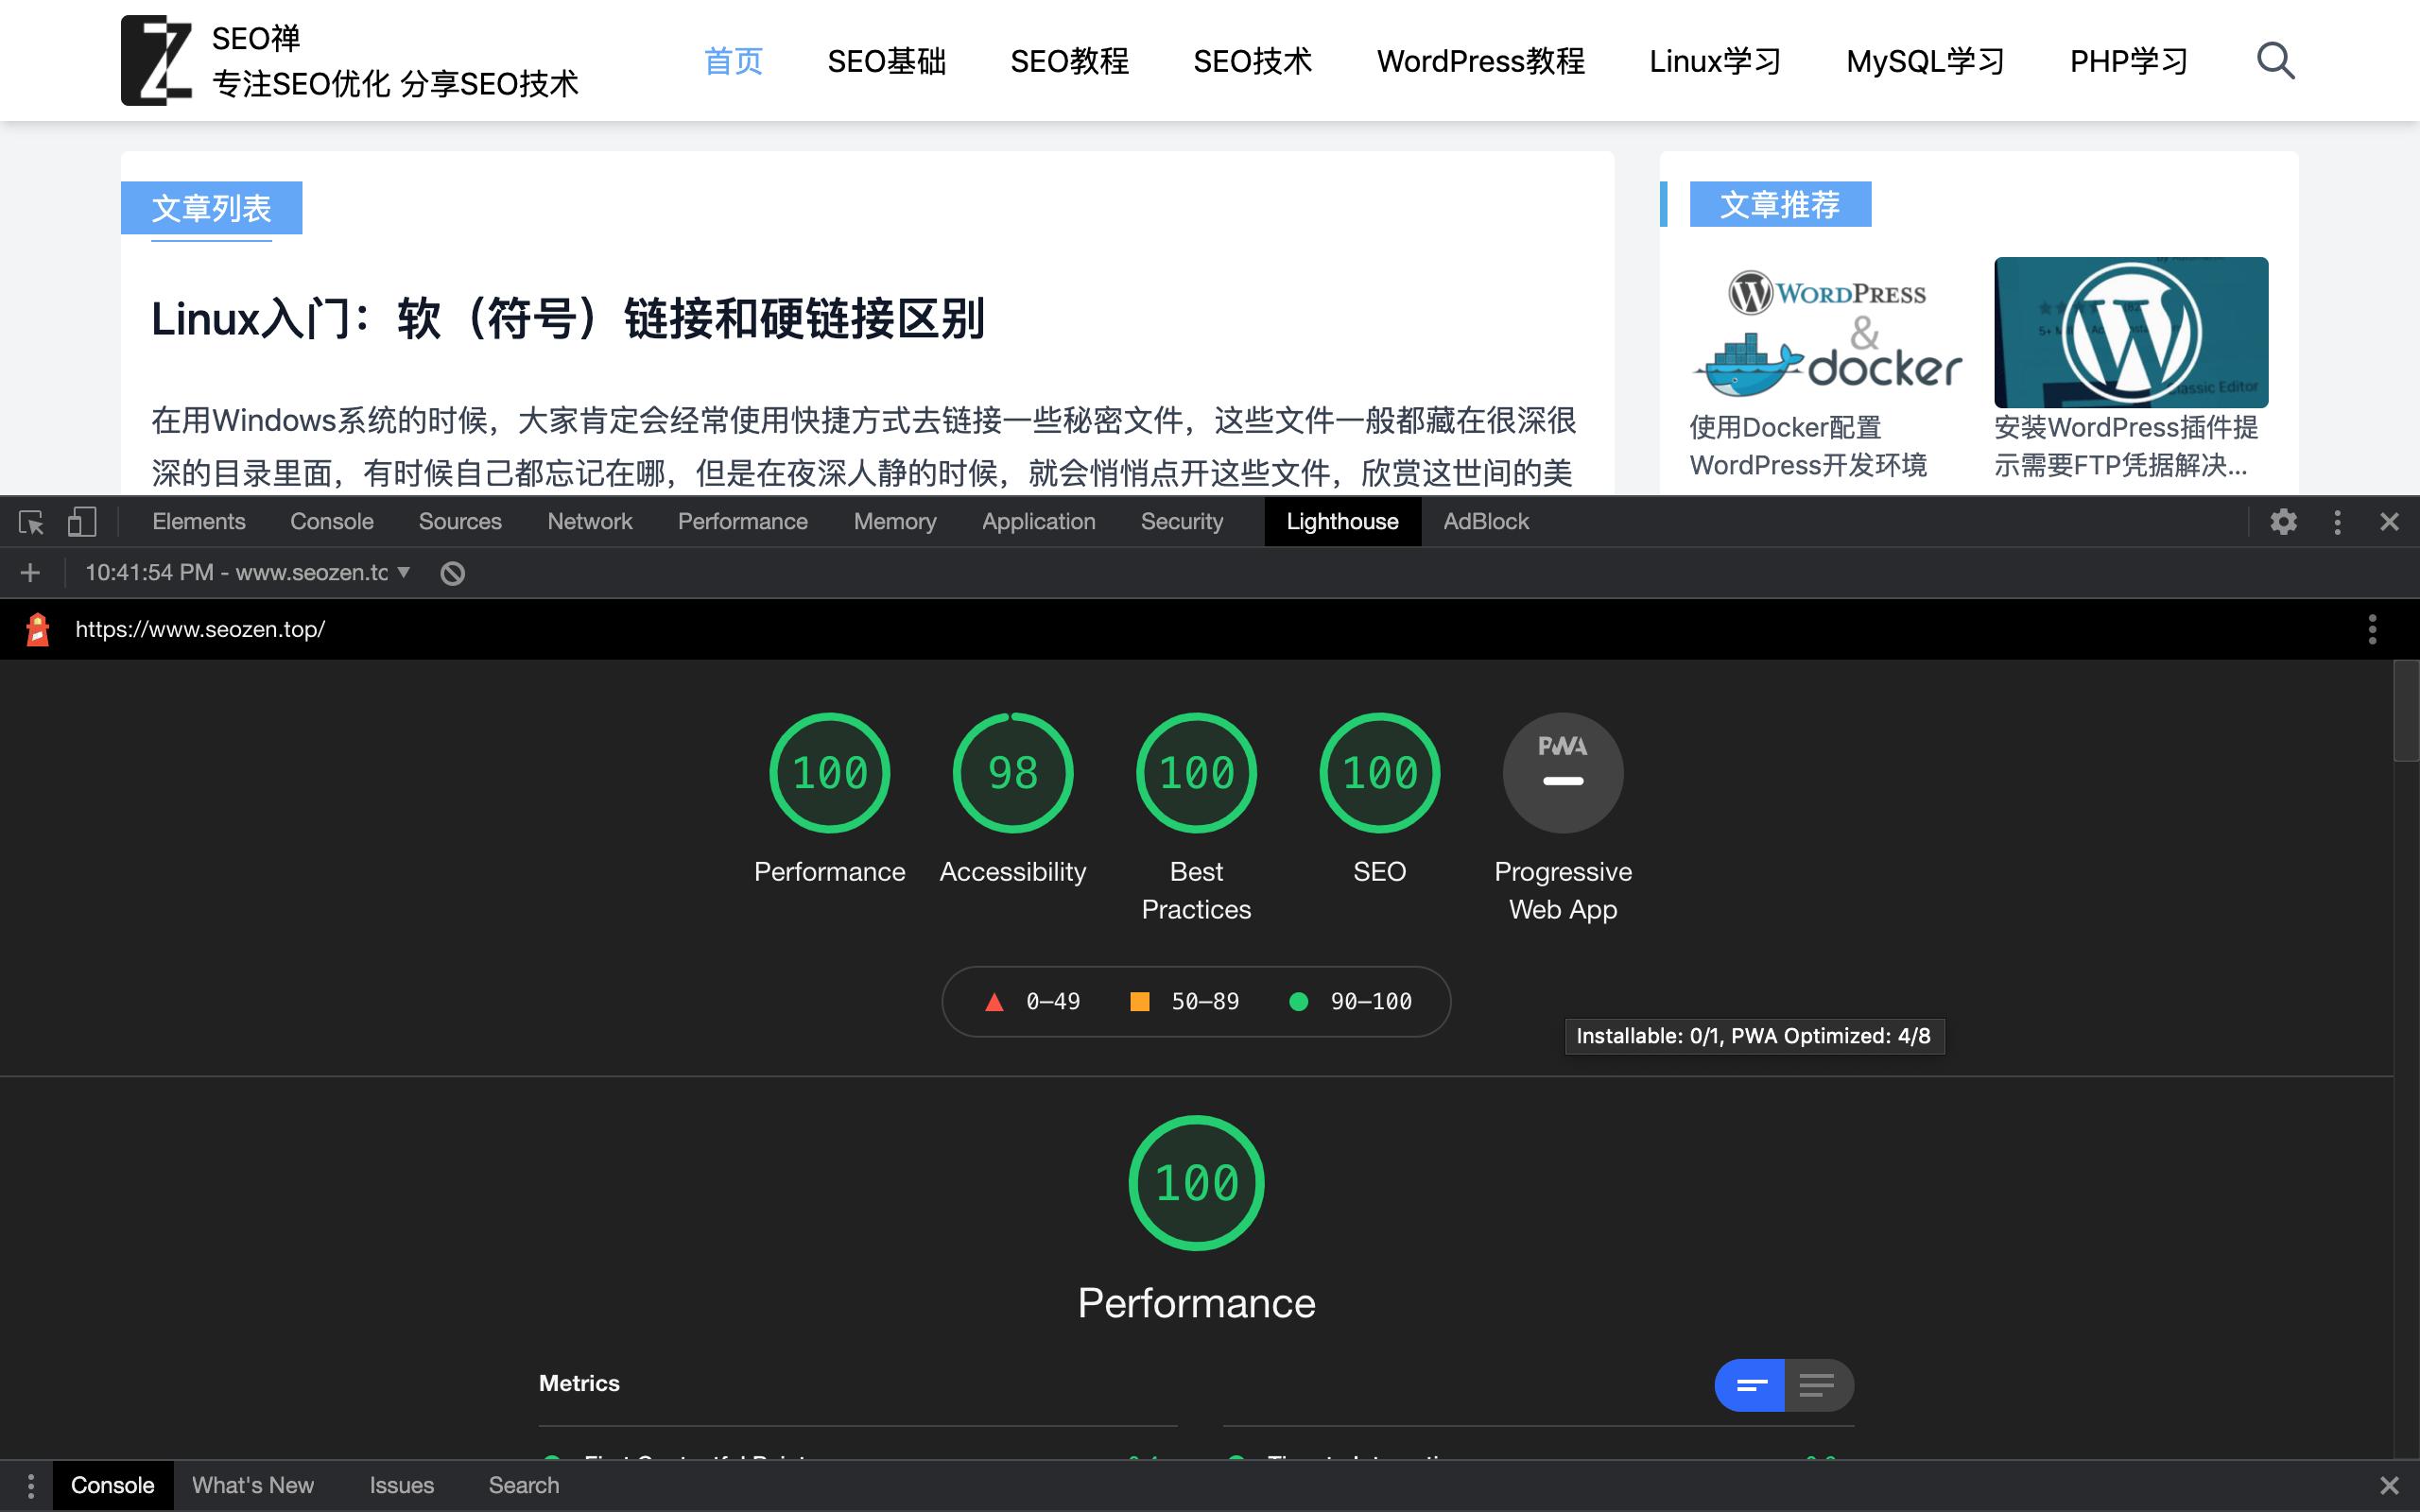 seo-lighthouse-scores